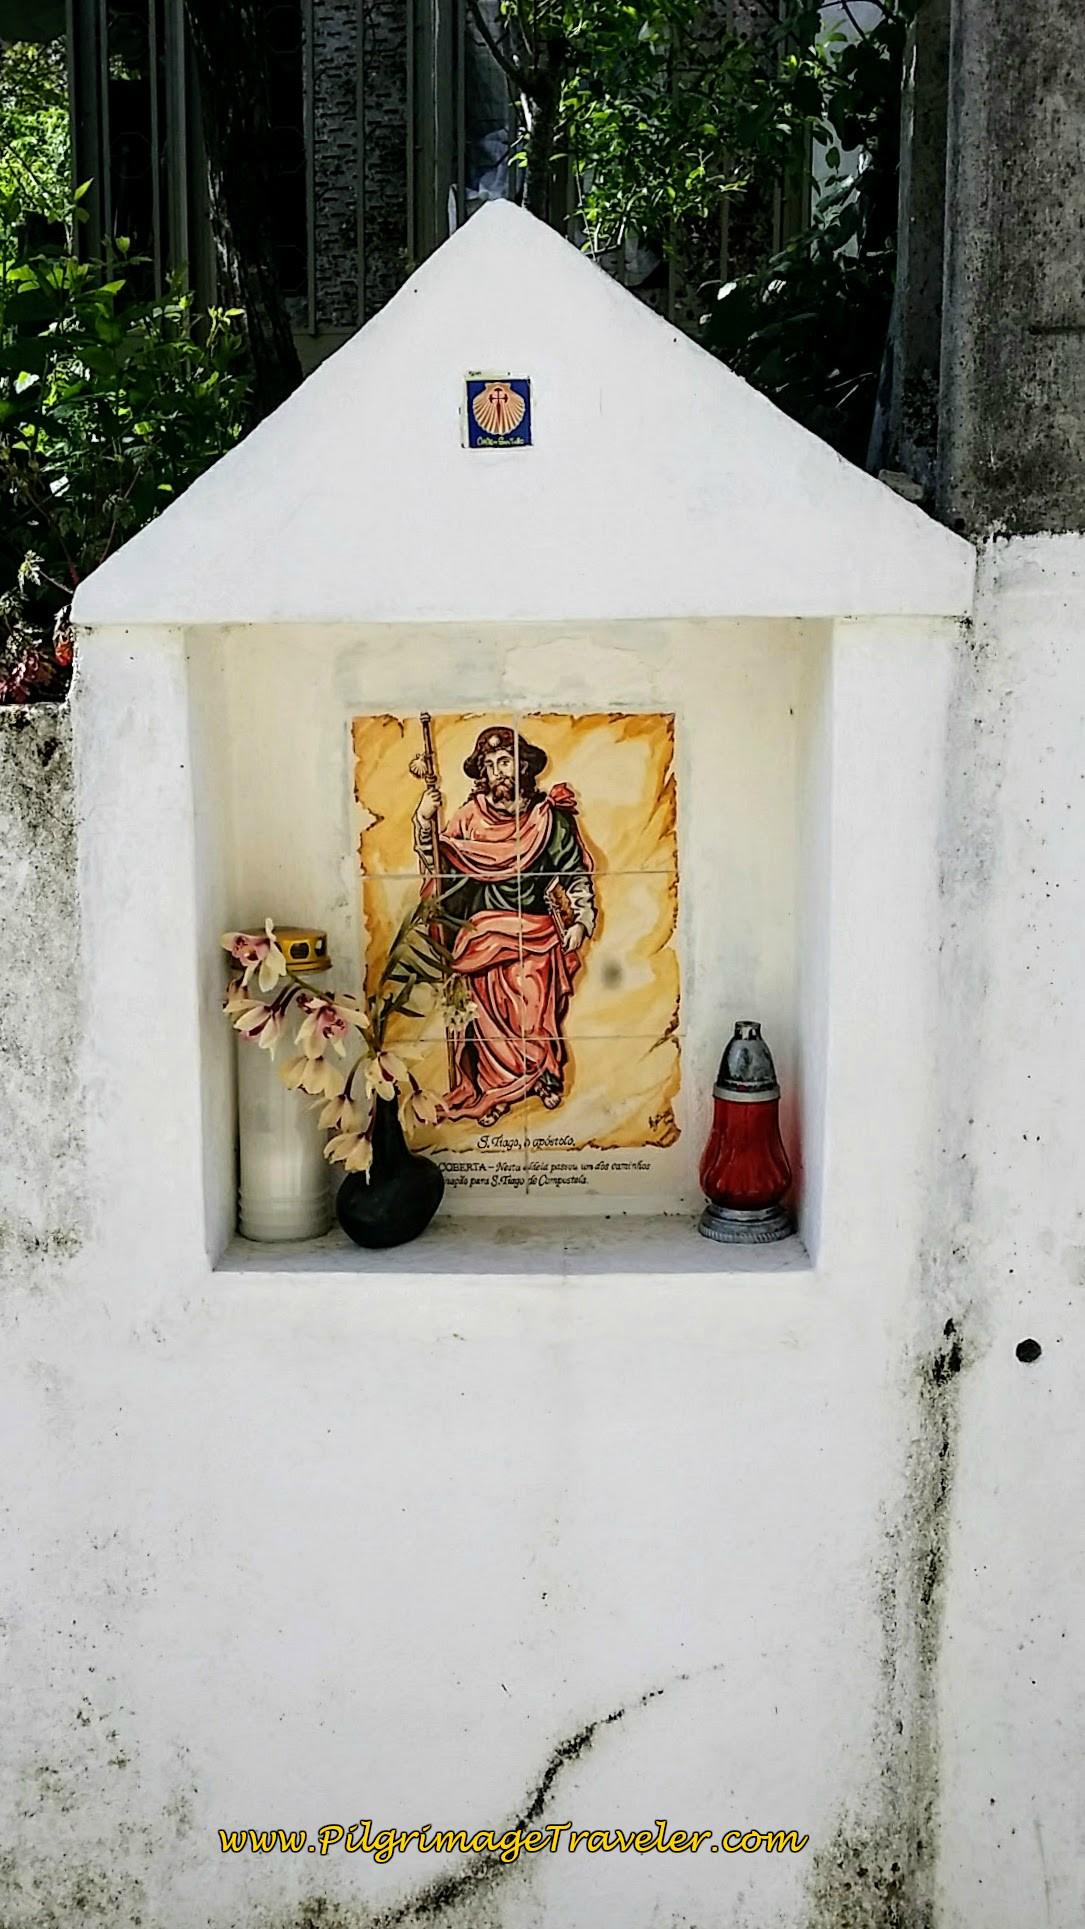 Roadside Shrine to Santiago